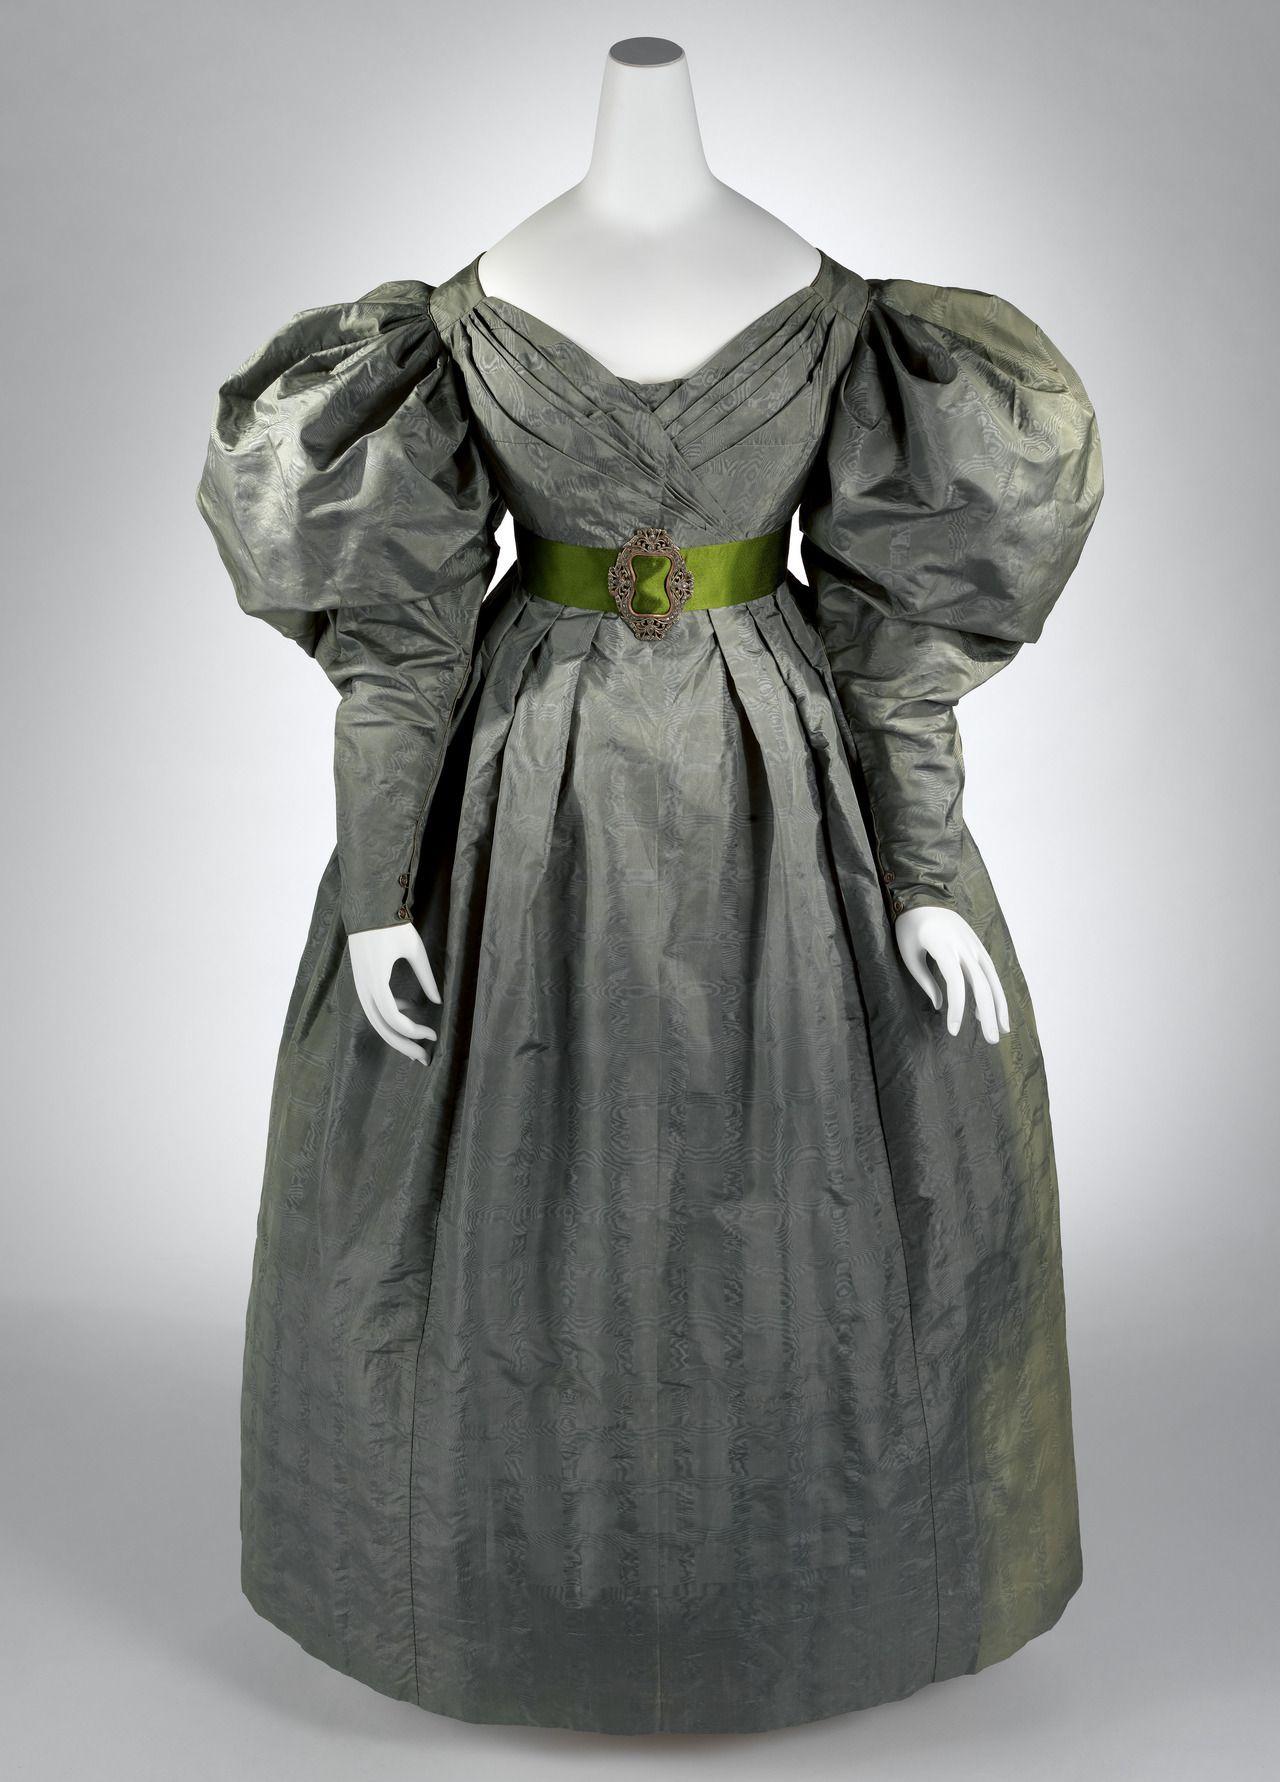 Dress ca. 1830 From the Metropolitan Museum of Art Rush Dresses, Historical Costume, Historical Clothing, Historical Dress, Victorian Fashion, 1800s Fashion, Antique Clothing, Fashion History, Biedermeier